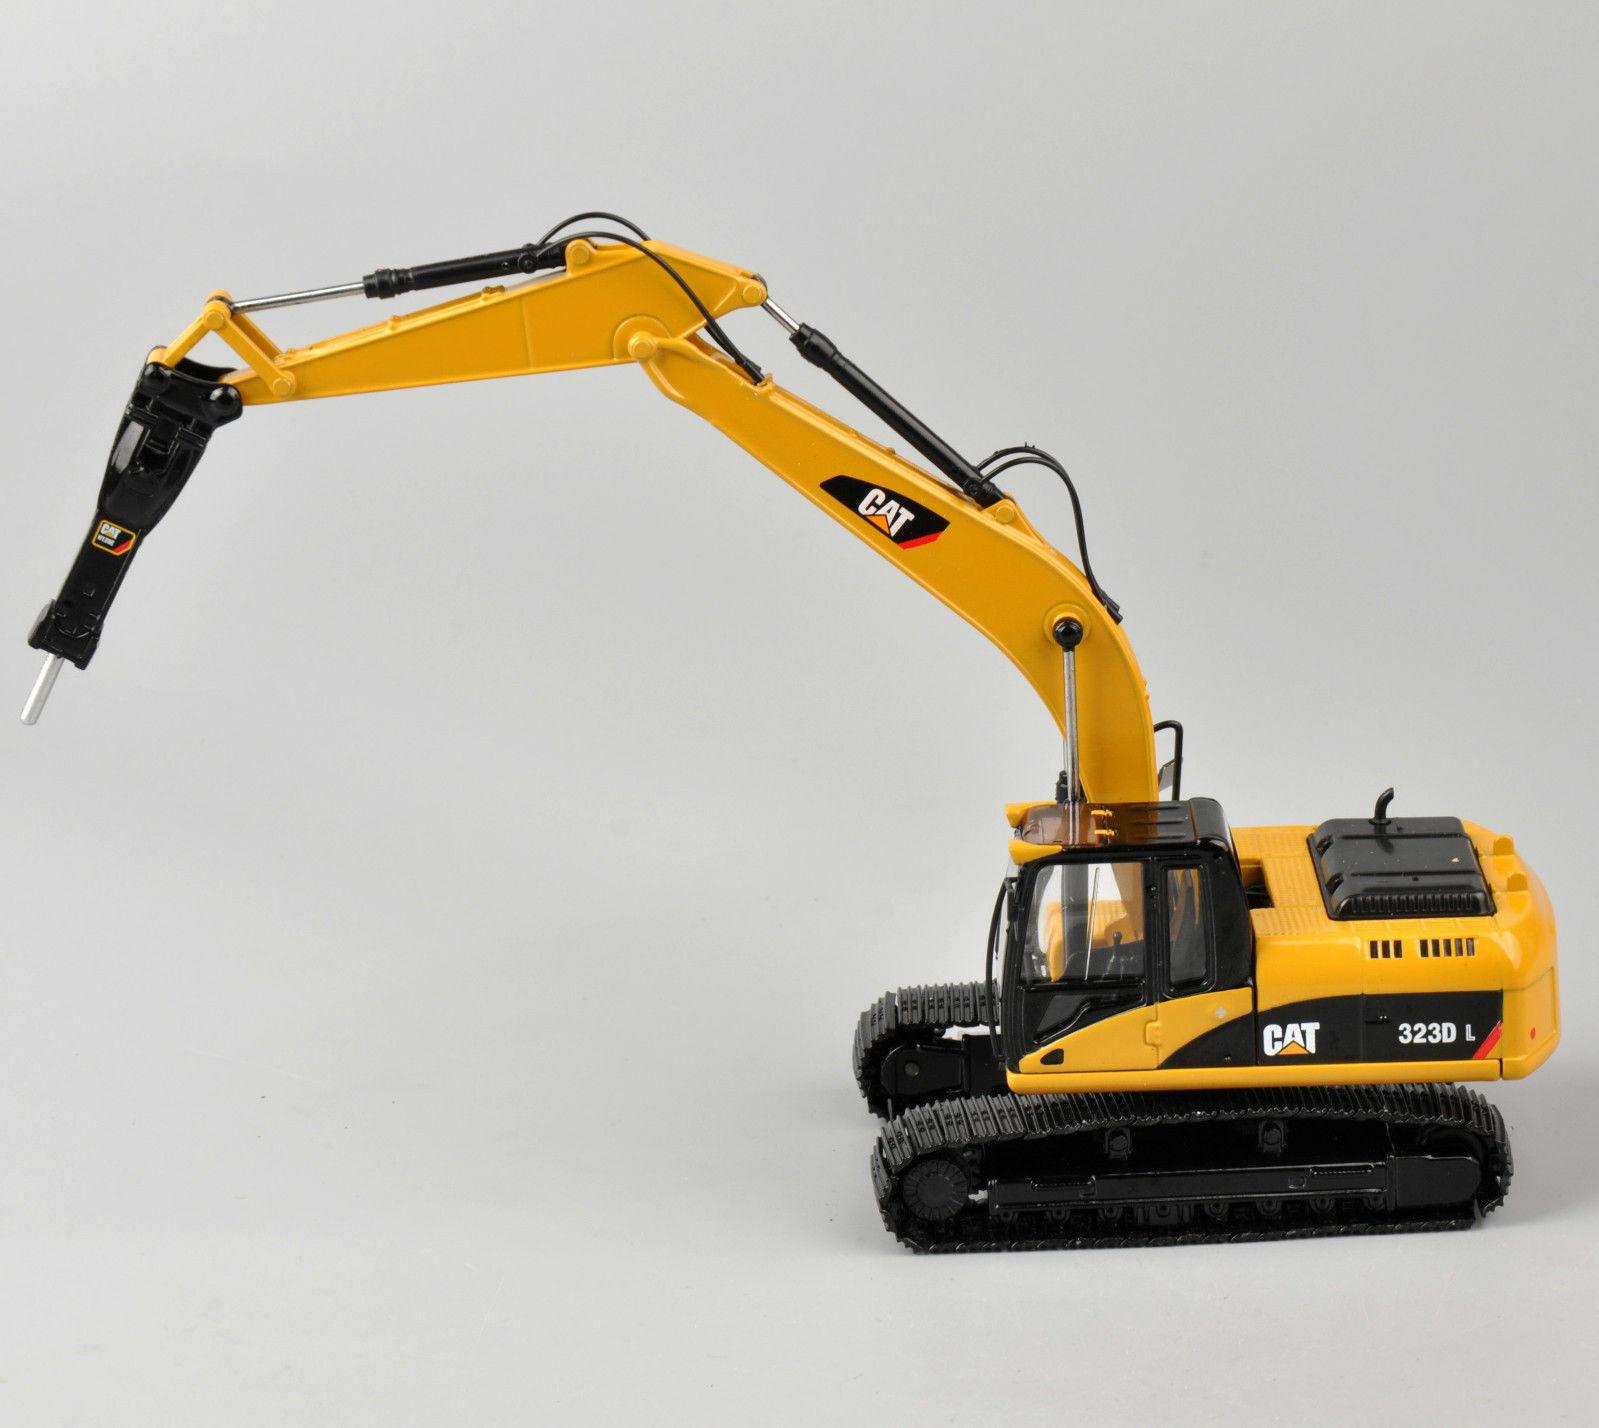 Norscot Caterpillar Cat 323D L Excavators With H120E Hydraulic Hammer Metal Tracks 1/50 Scale Diecast Model